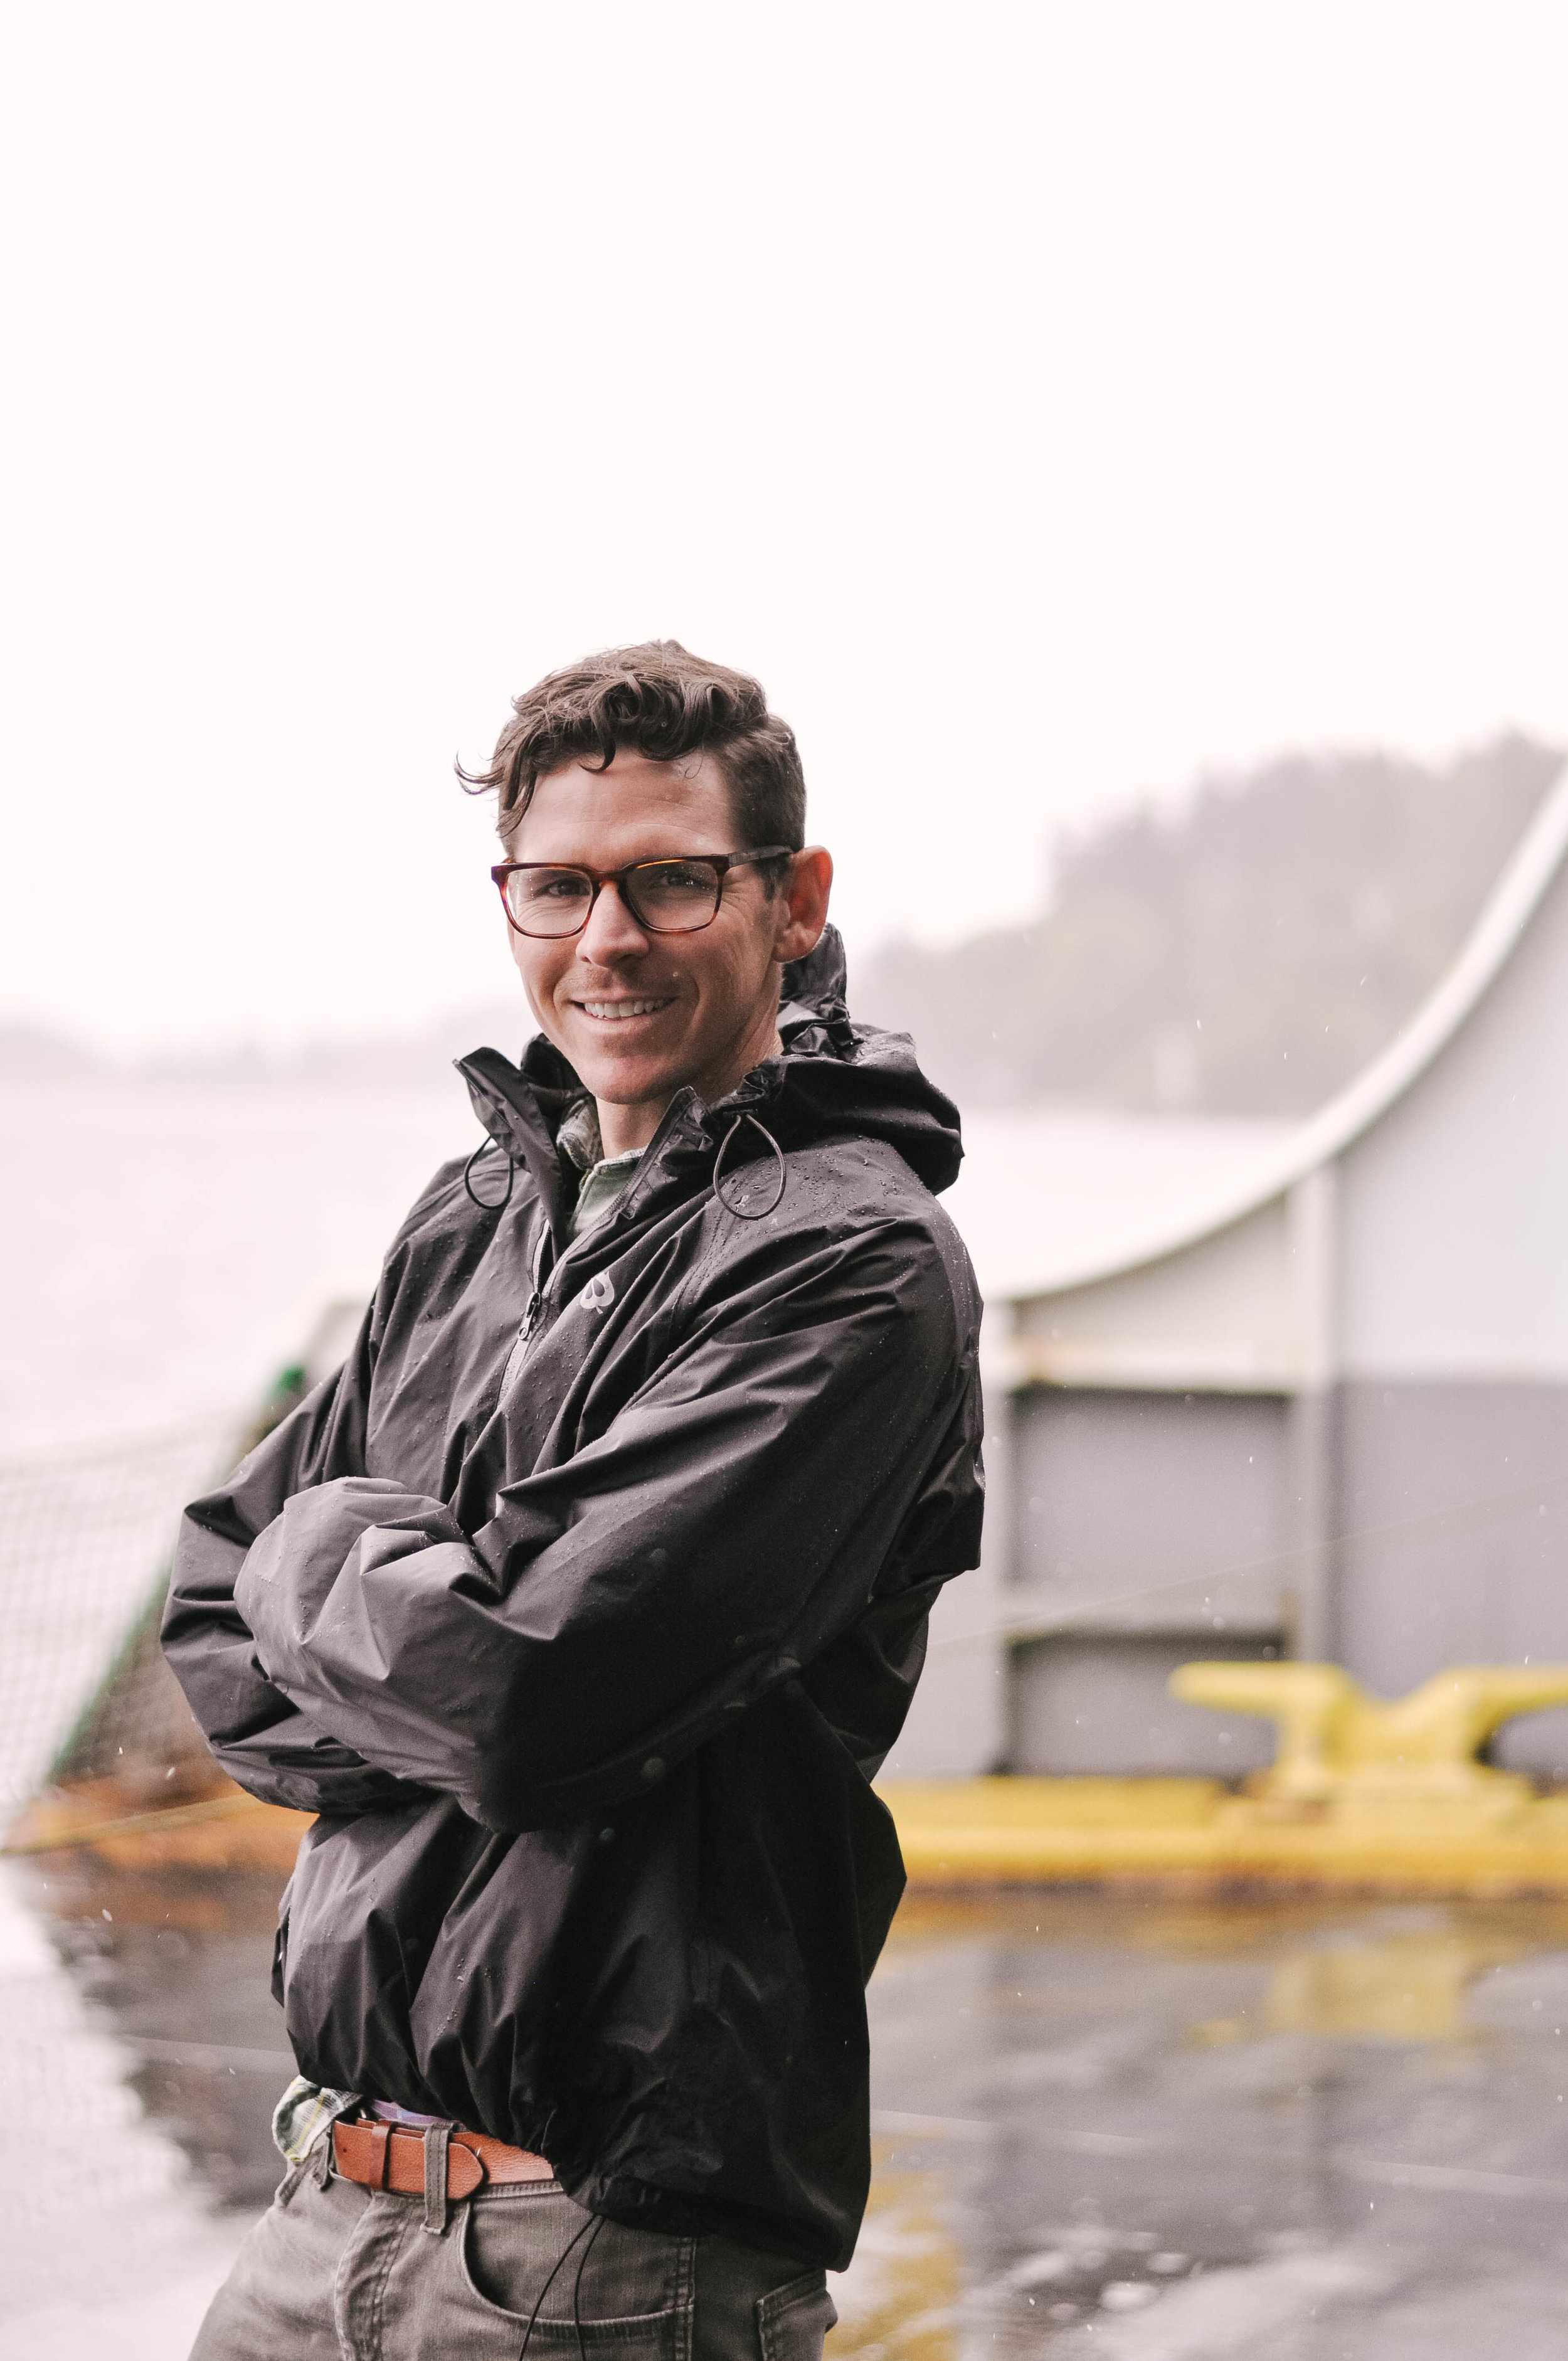 Man in raincoat on boat